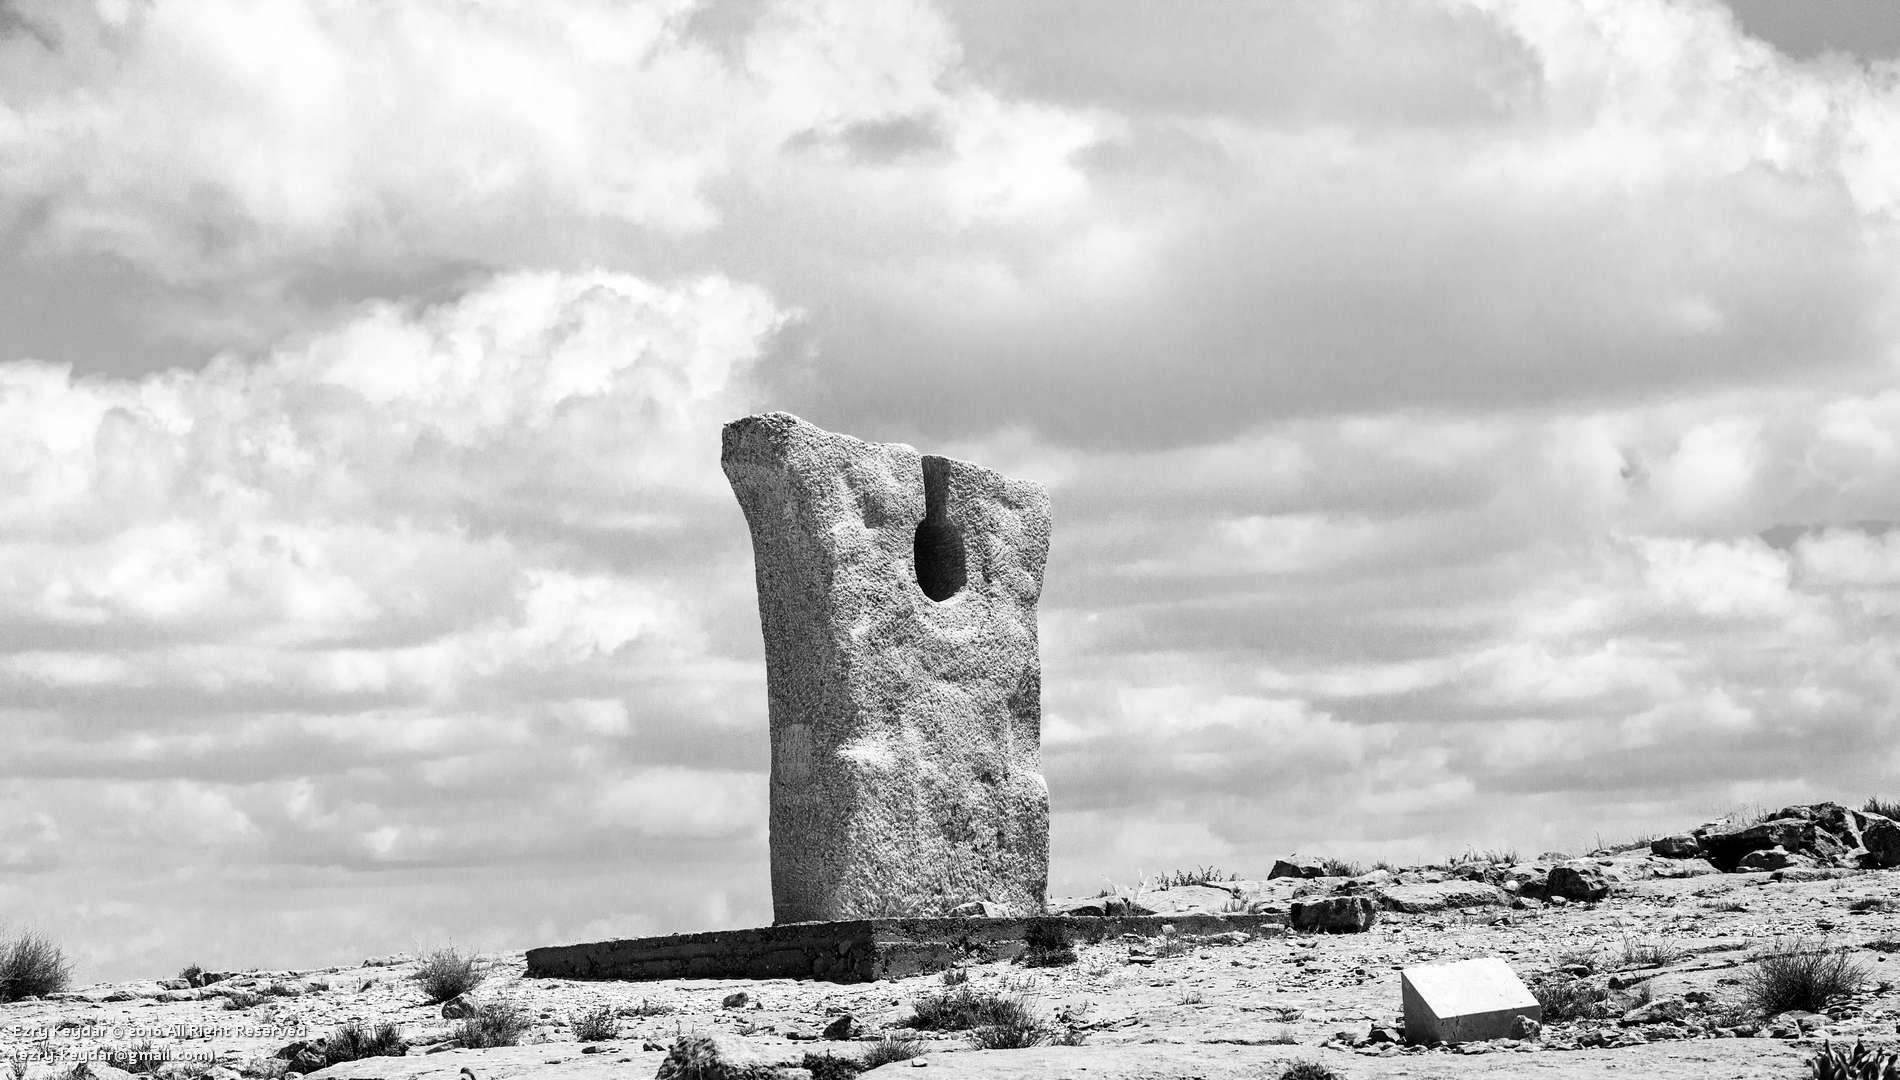 Desert Sculpture Park, Mitzpe Ramon